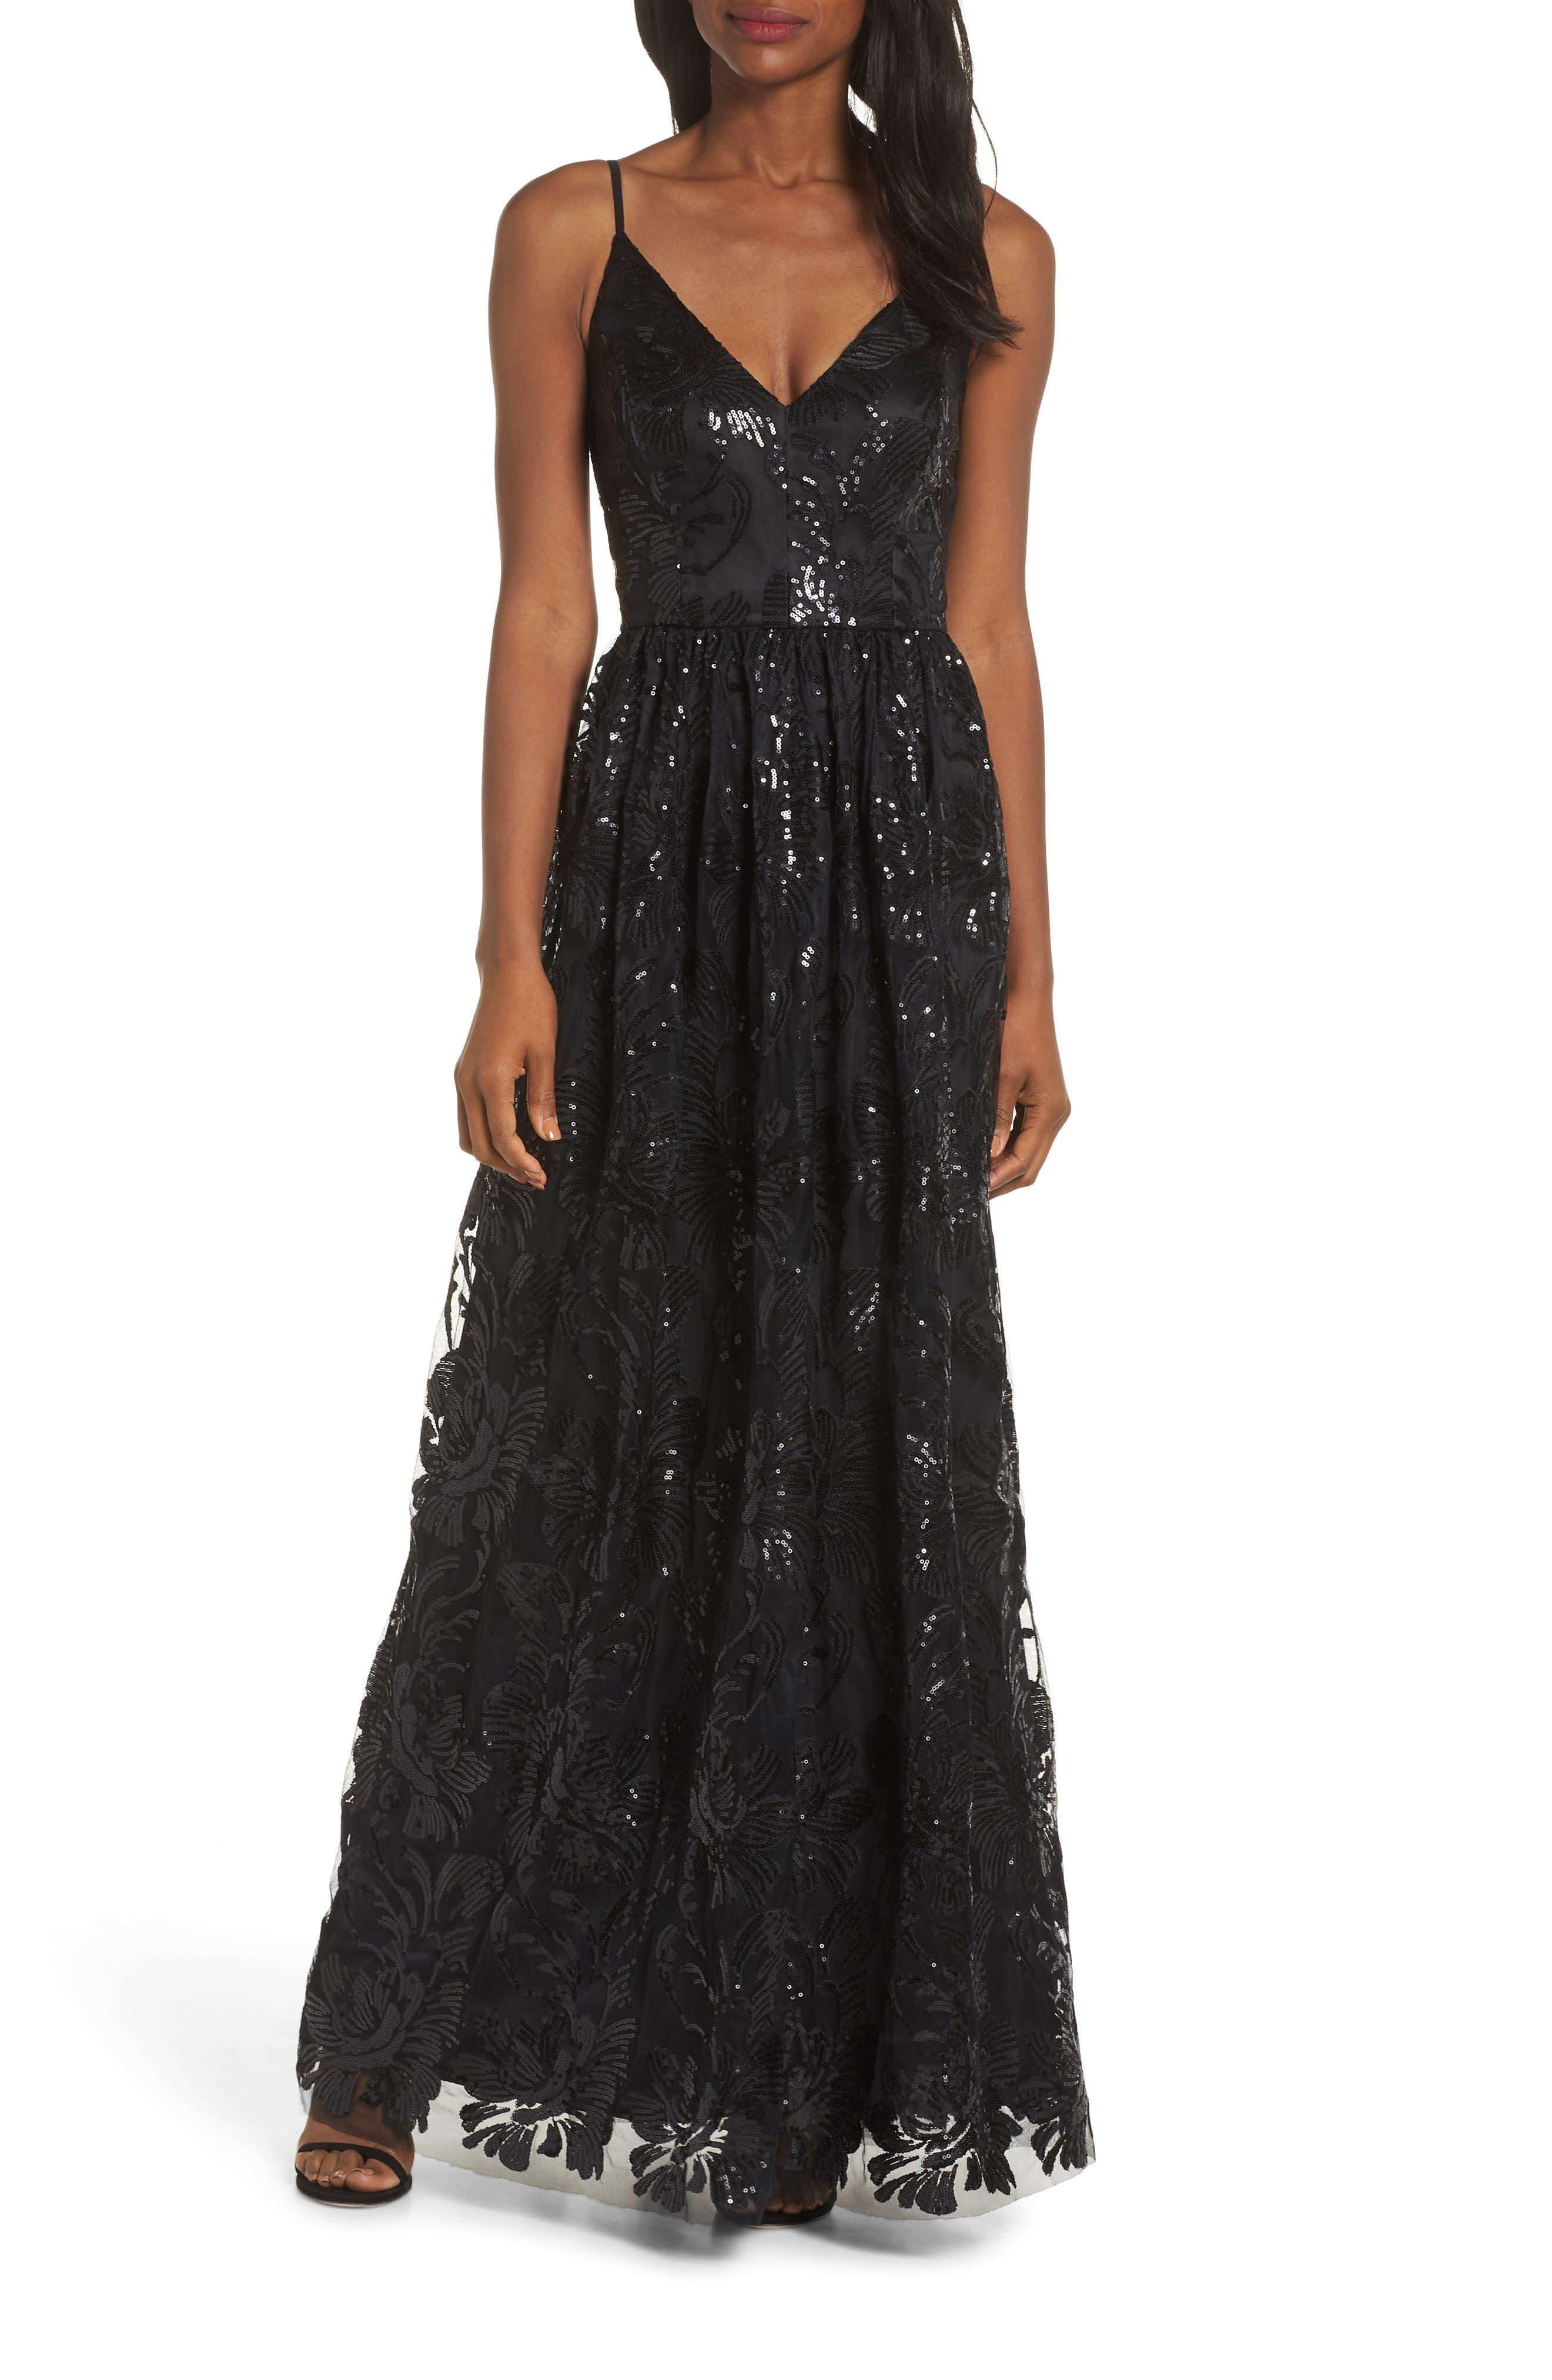 ELIZA J, Sequin Embroidered Mesh Evening Dress, Main thumbnail 1, color, BLACK